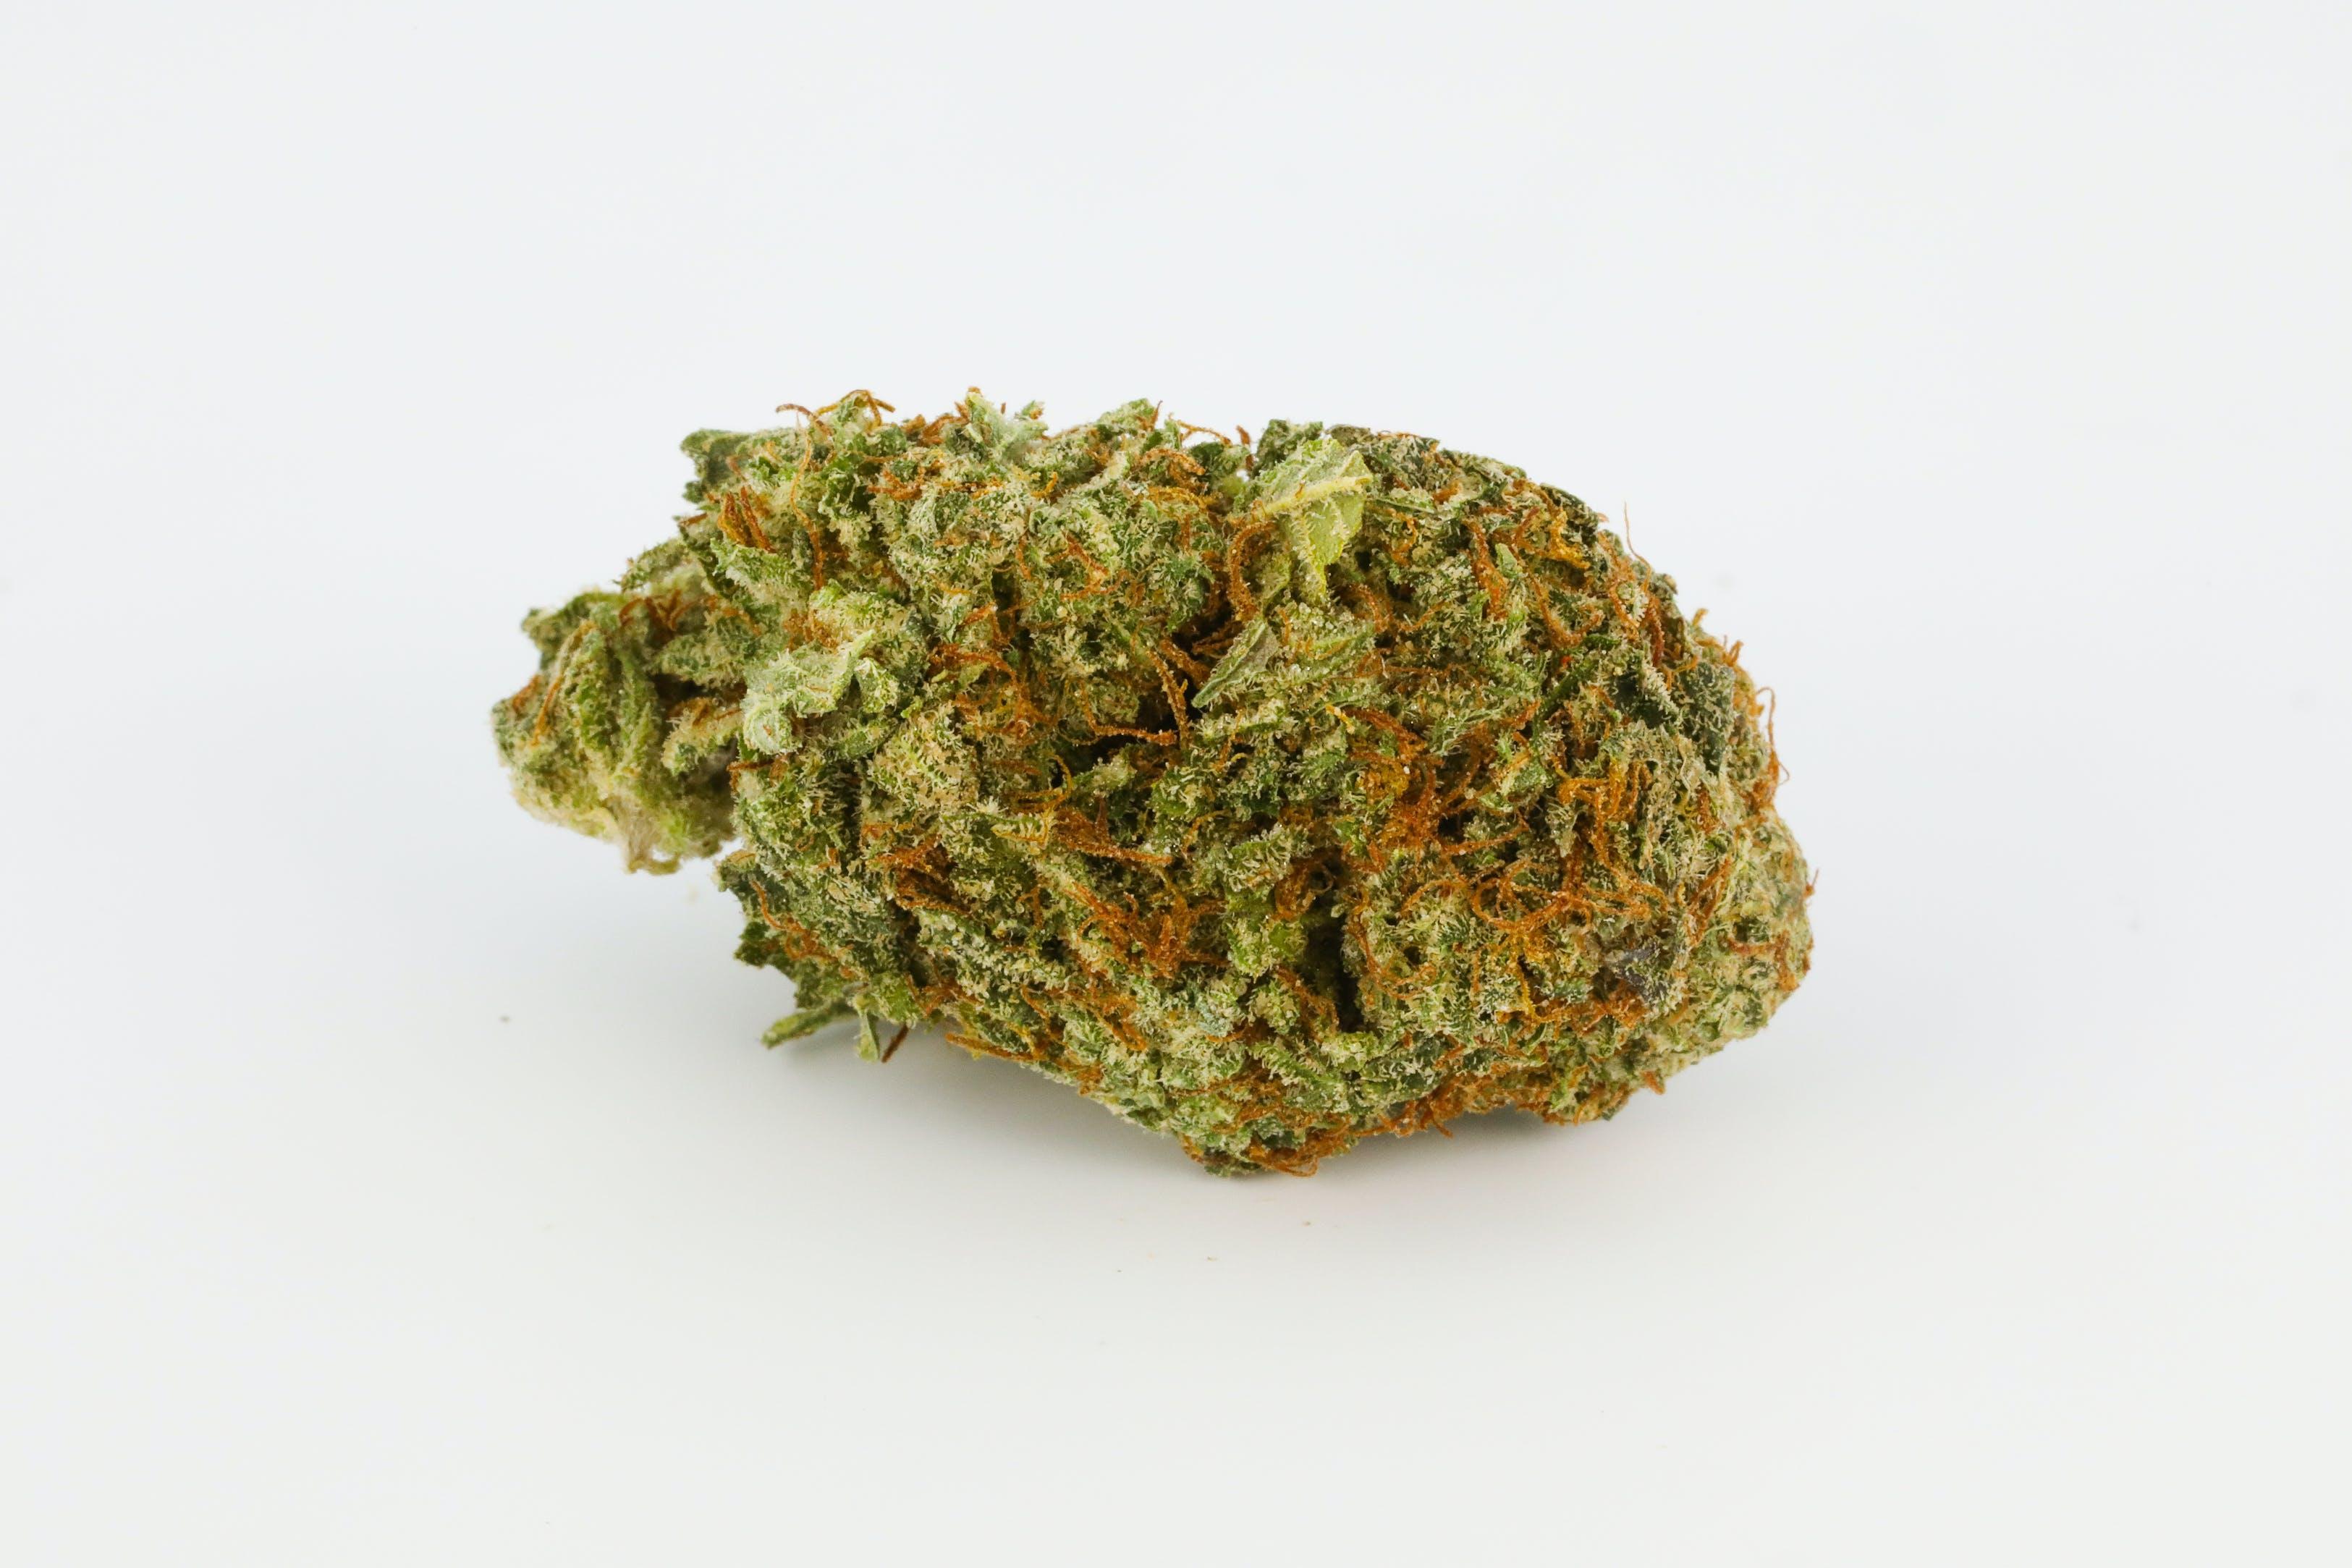 Triangle Kush Weed; Triangle Kush Cannabis Strain; Triangle Kush Hybrid Marijuana Strain